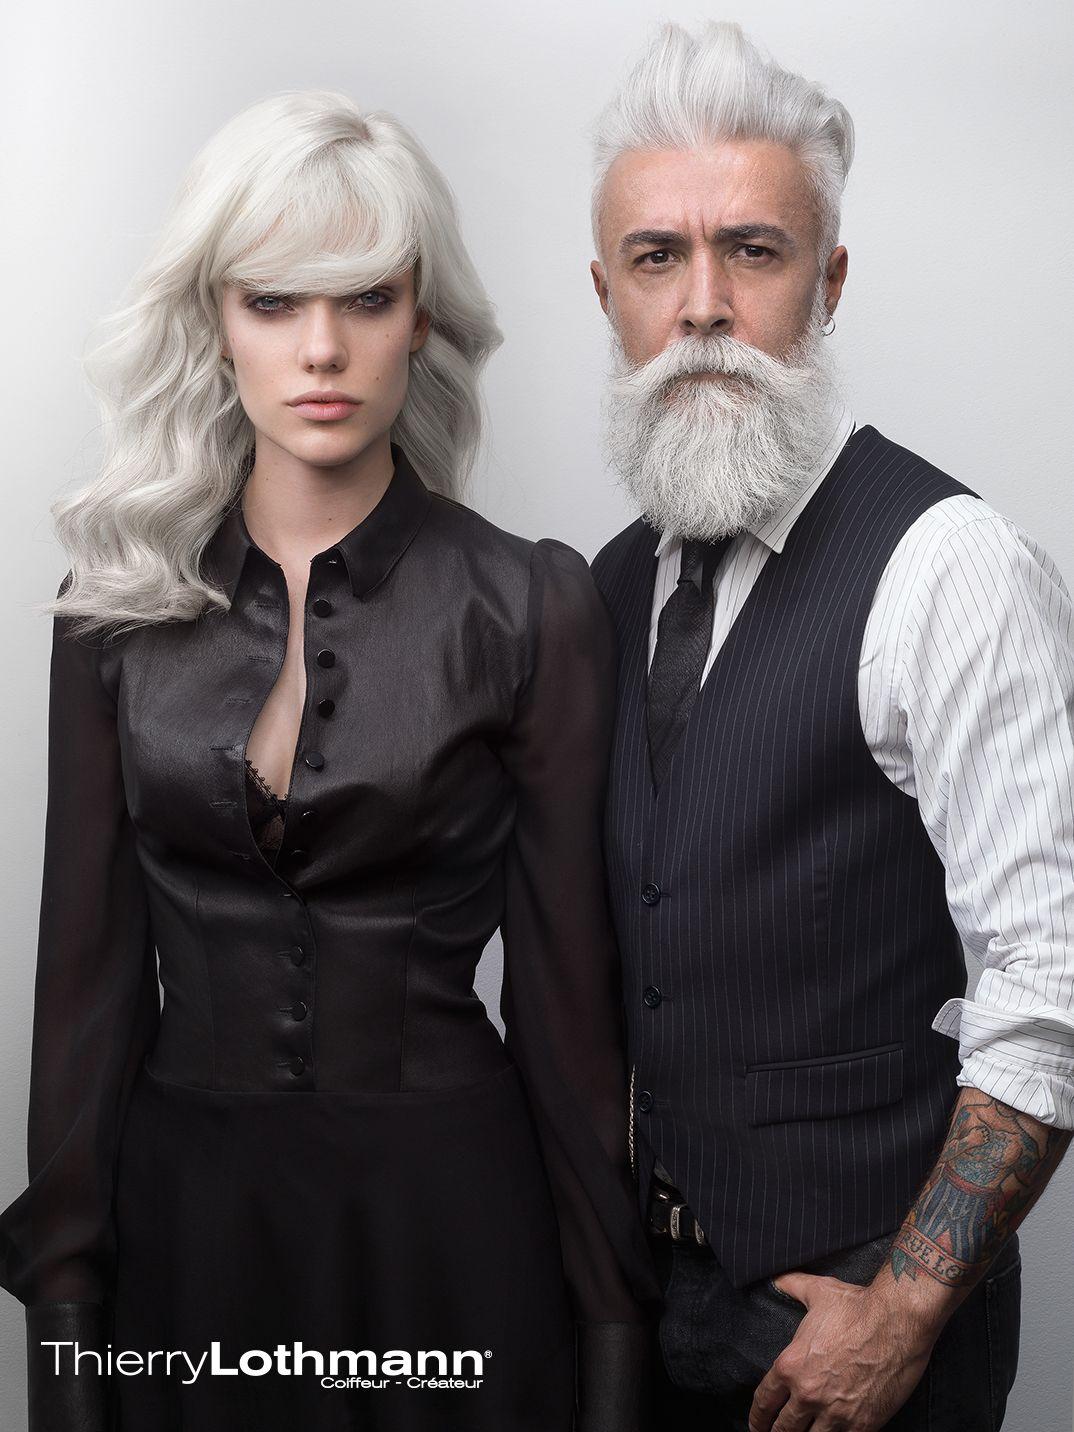 Thierry Lothmann Styles De Barbe Cheveux Blancs Barbes Grises